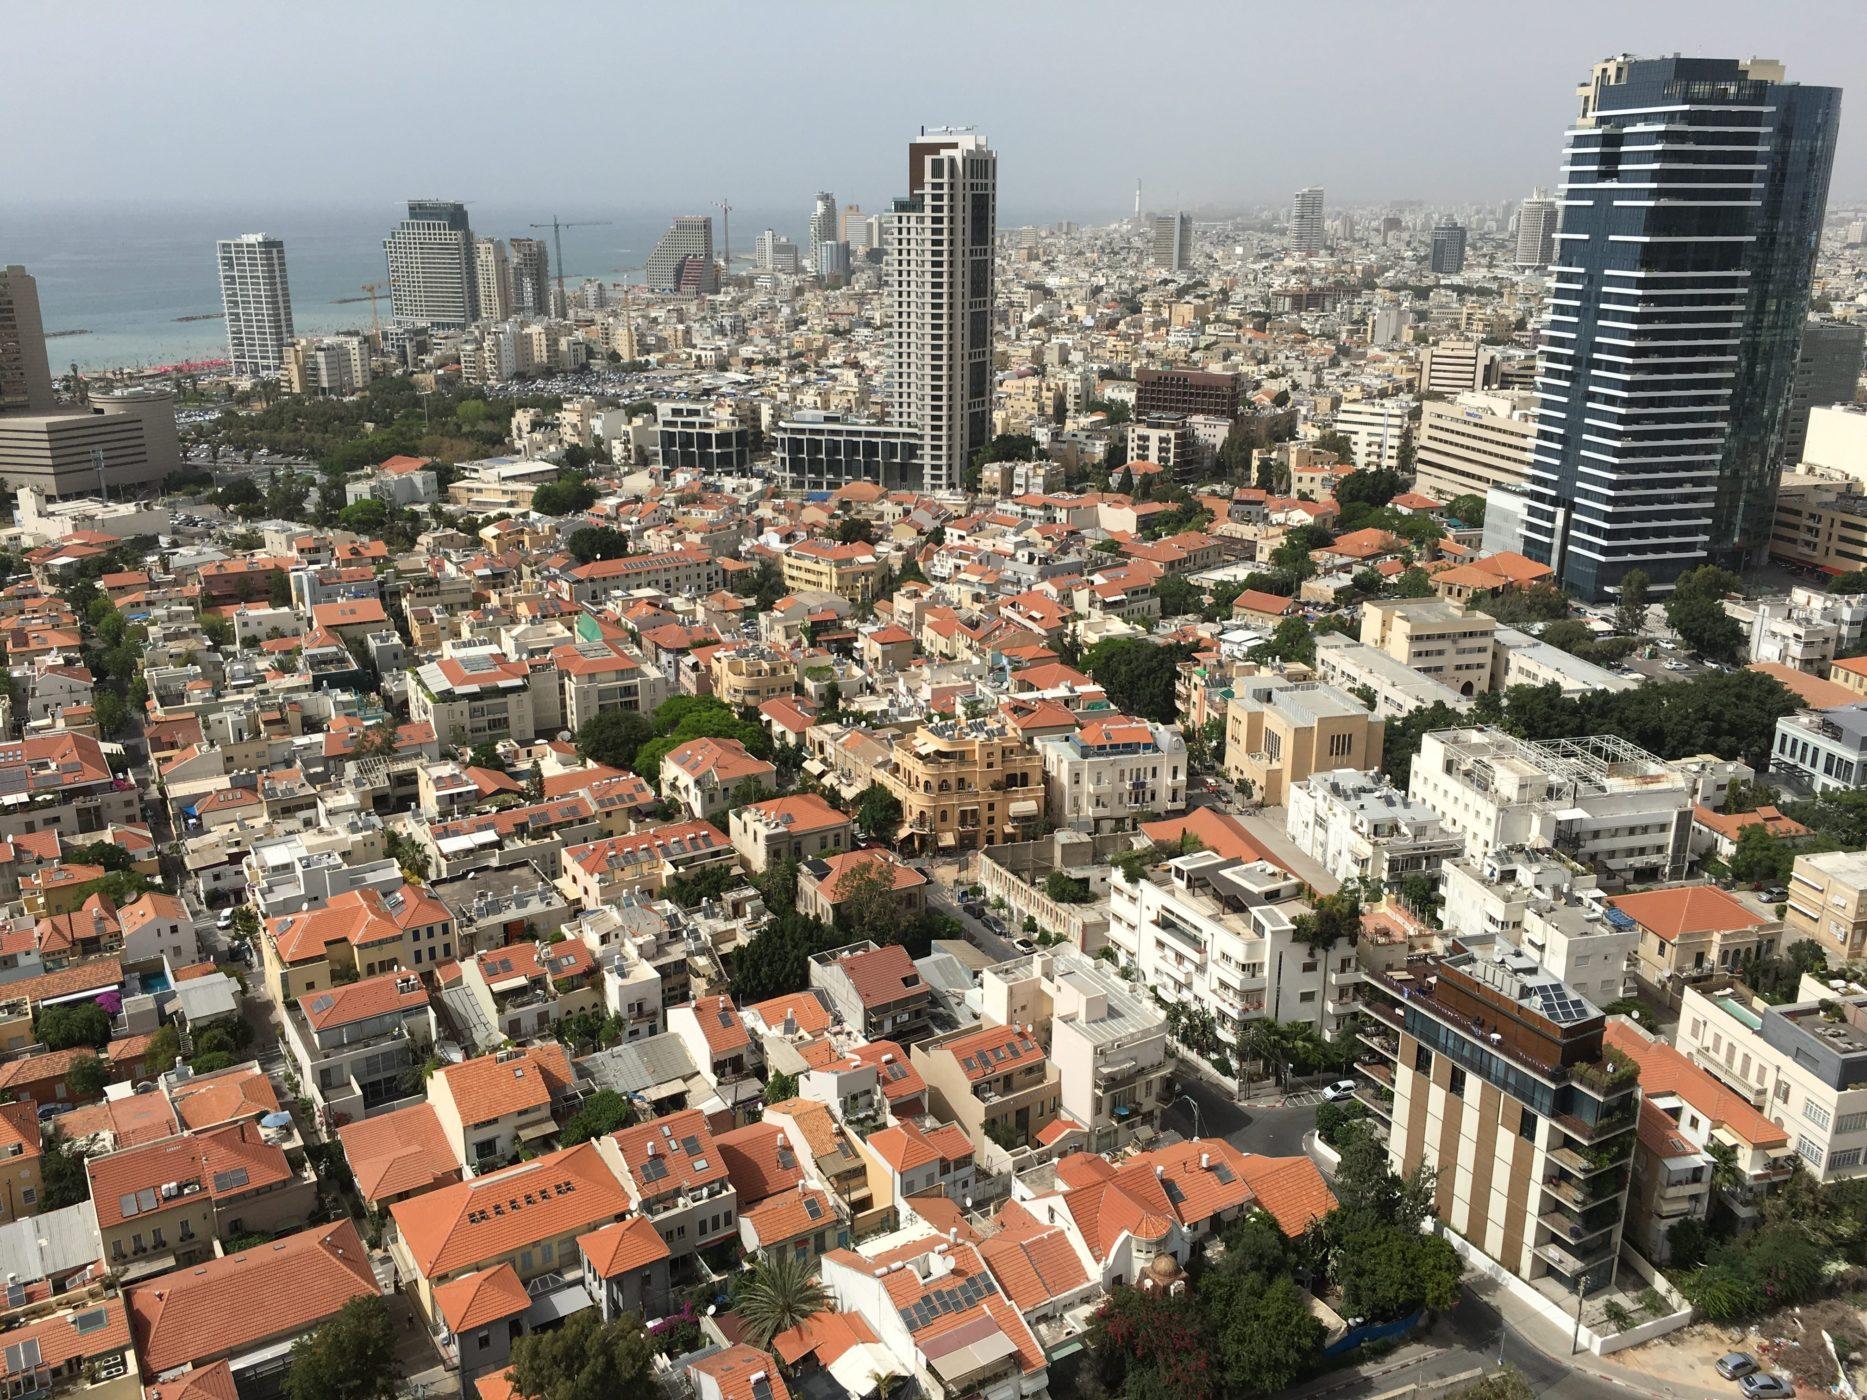 tel aviv, photo by Roy L